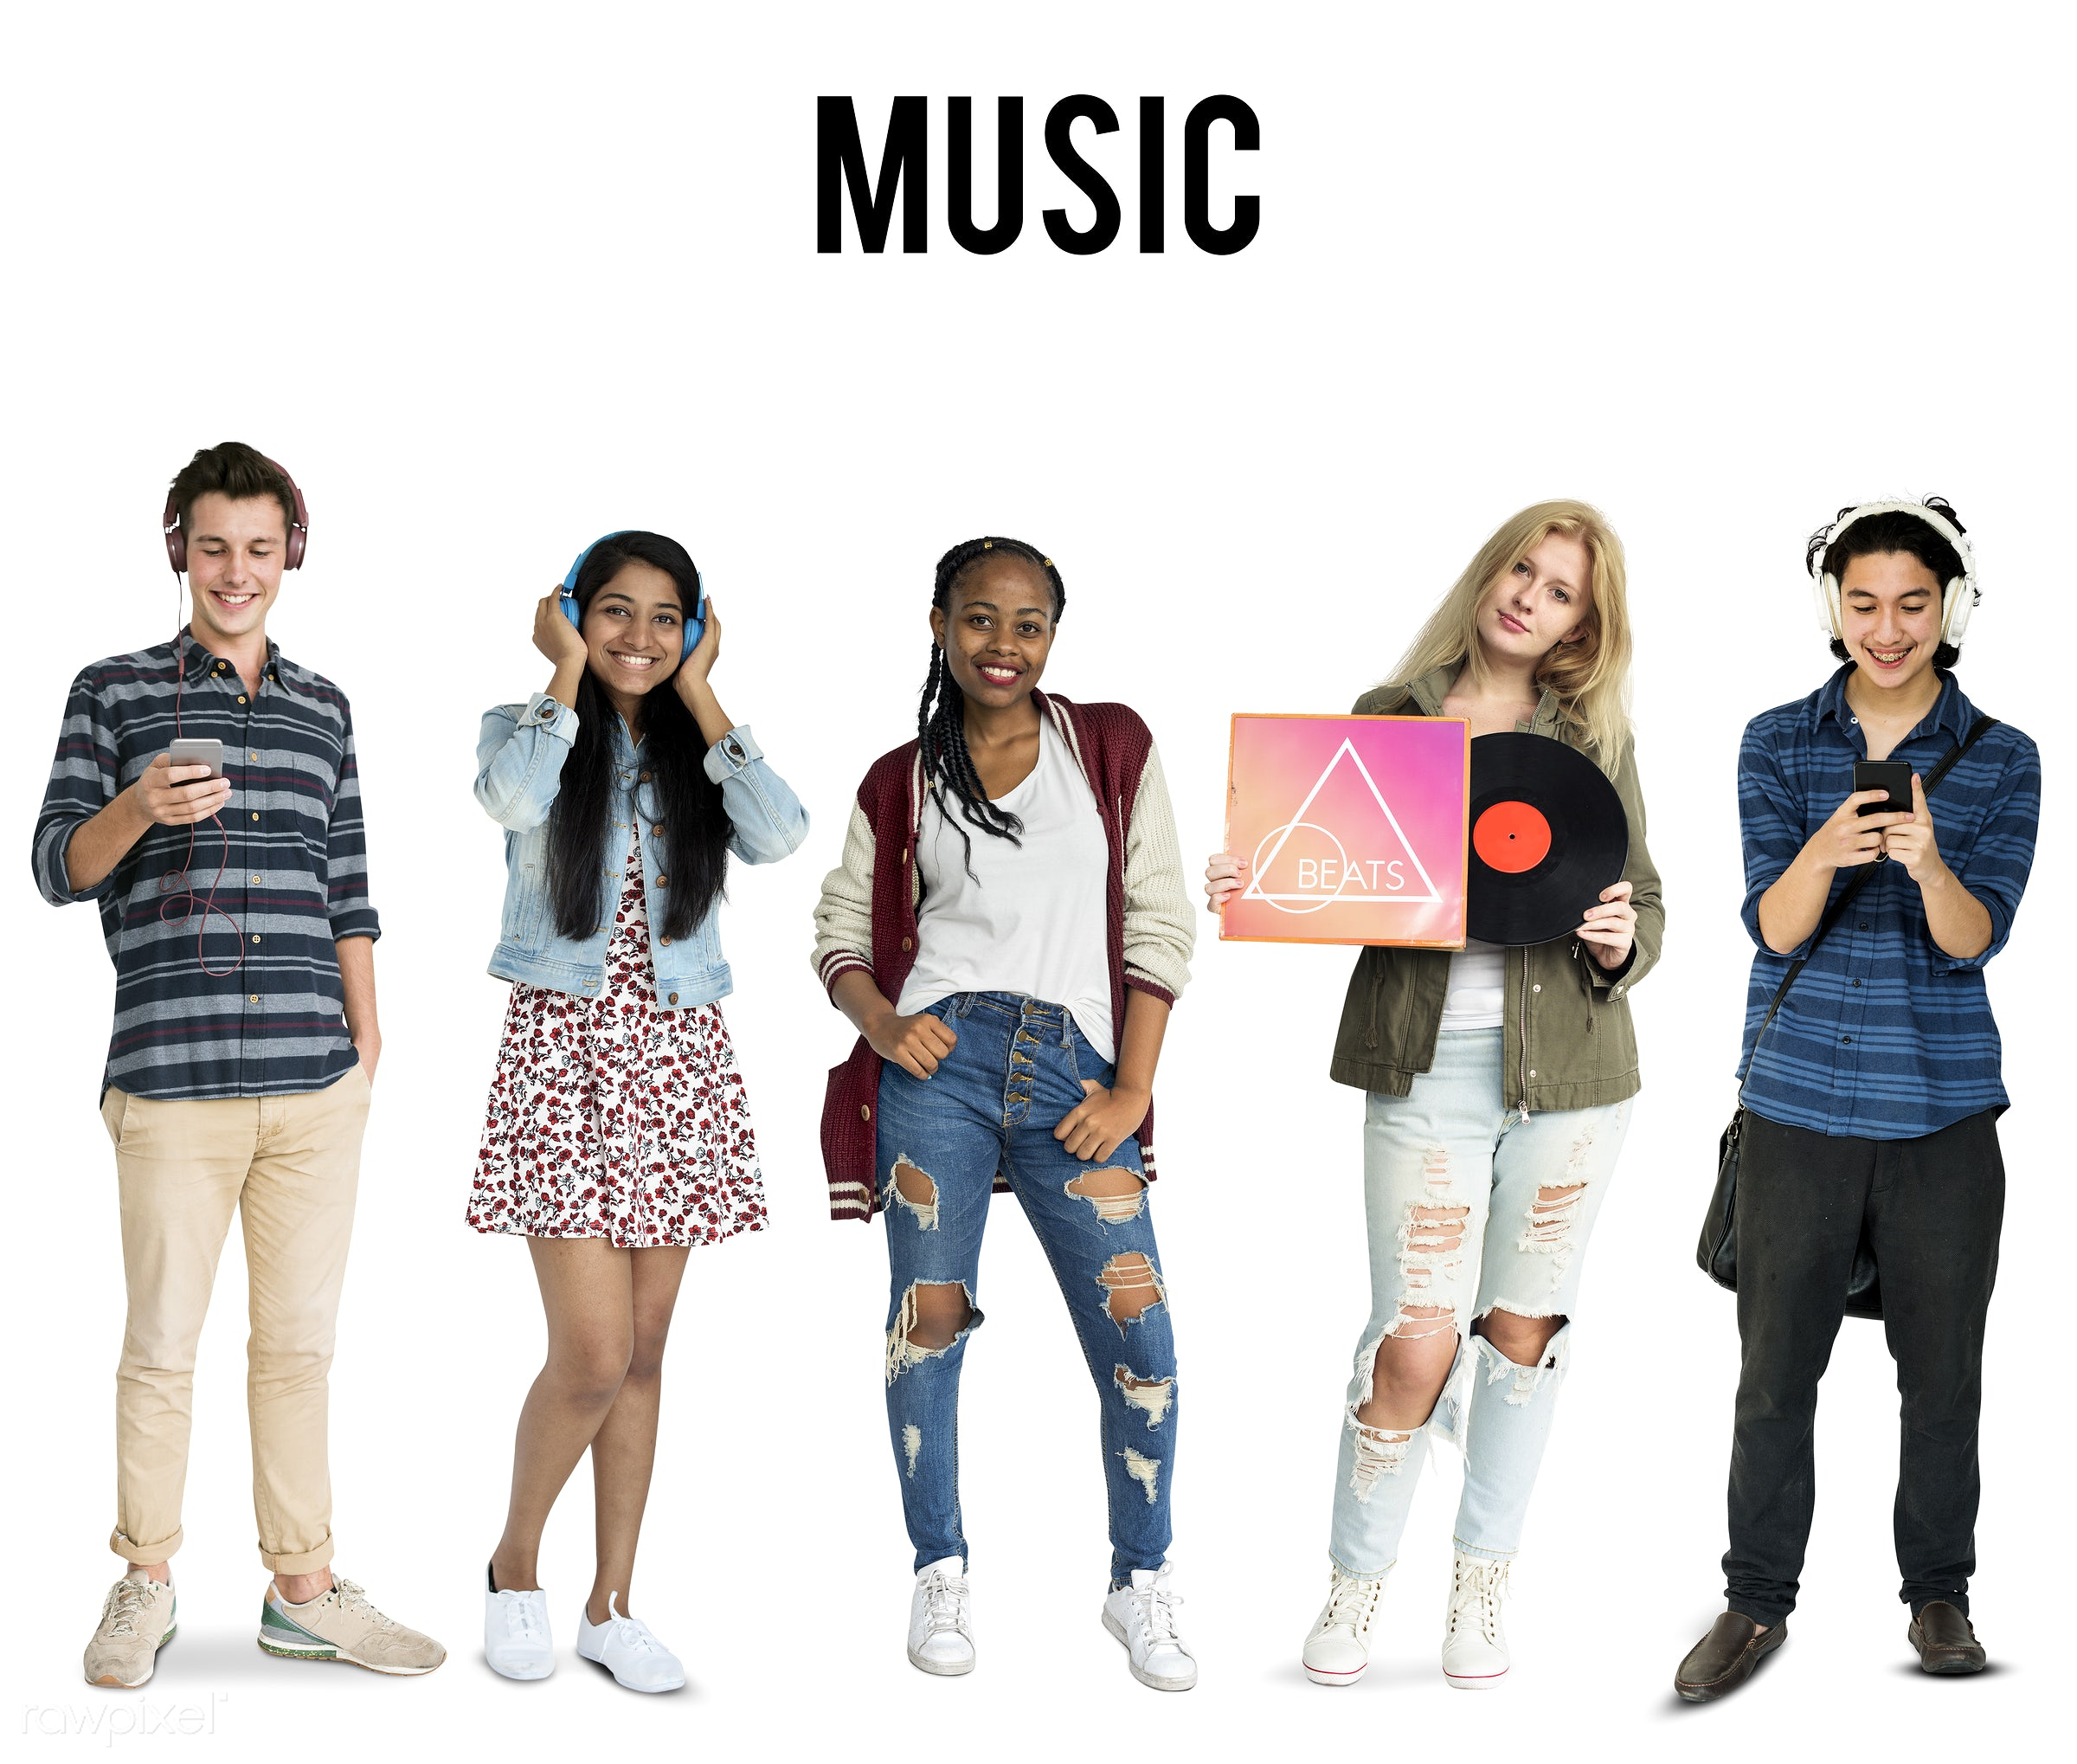 studio, person, phone, diverse, entertain, recreation, people, caucasian, asian, young adult, woman, lifestyle, studio...